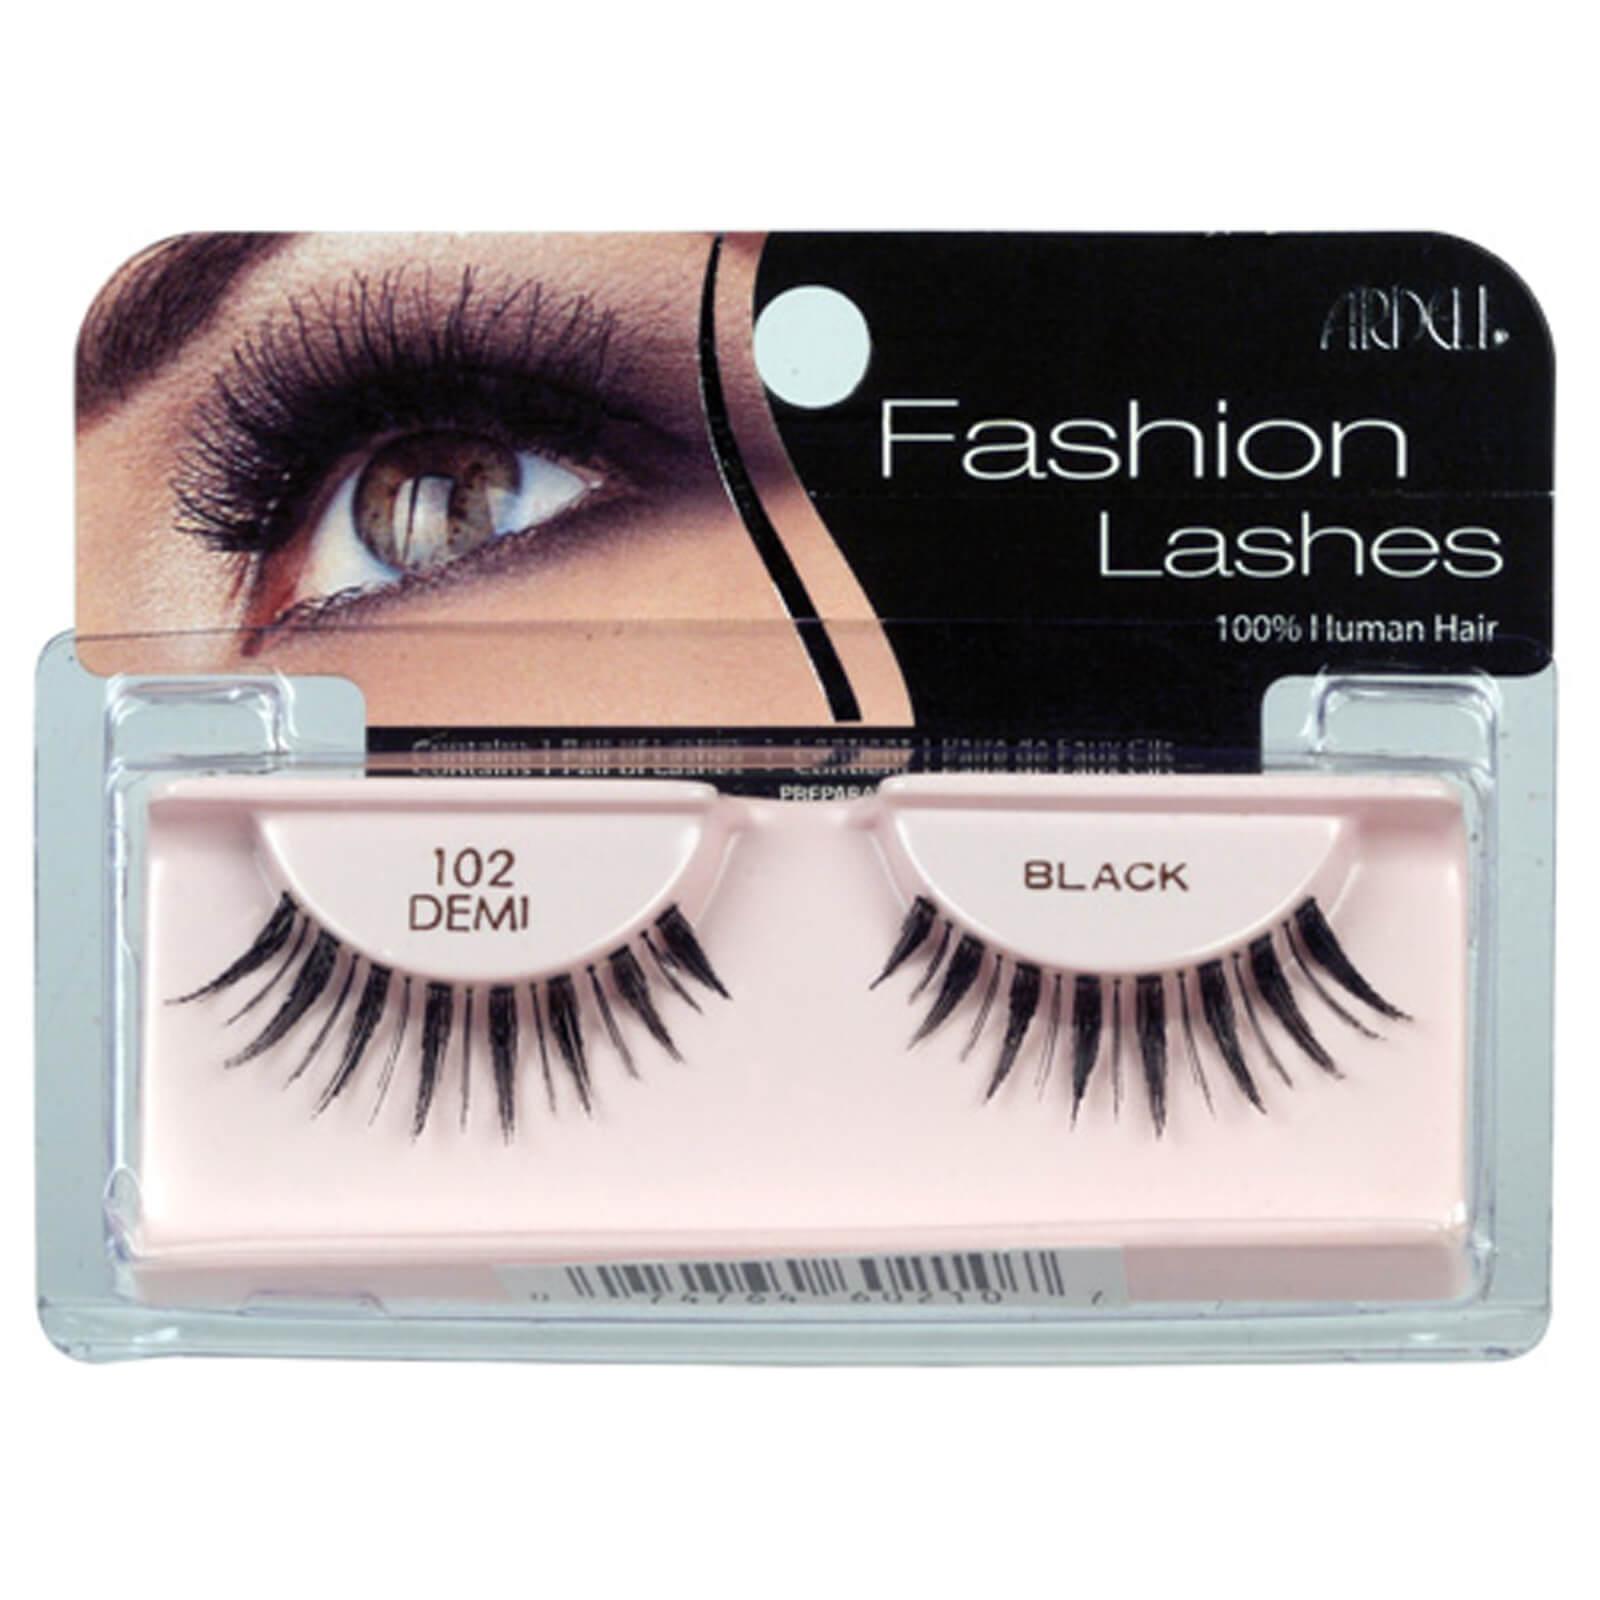 650263b7c46 Ardell Fashion Lashes 102 Demi Black   Buy Online At RY